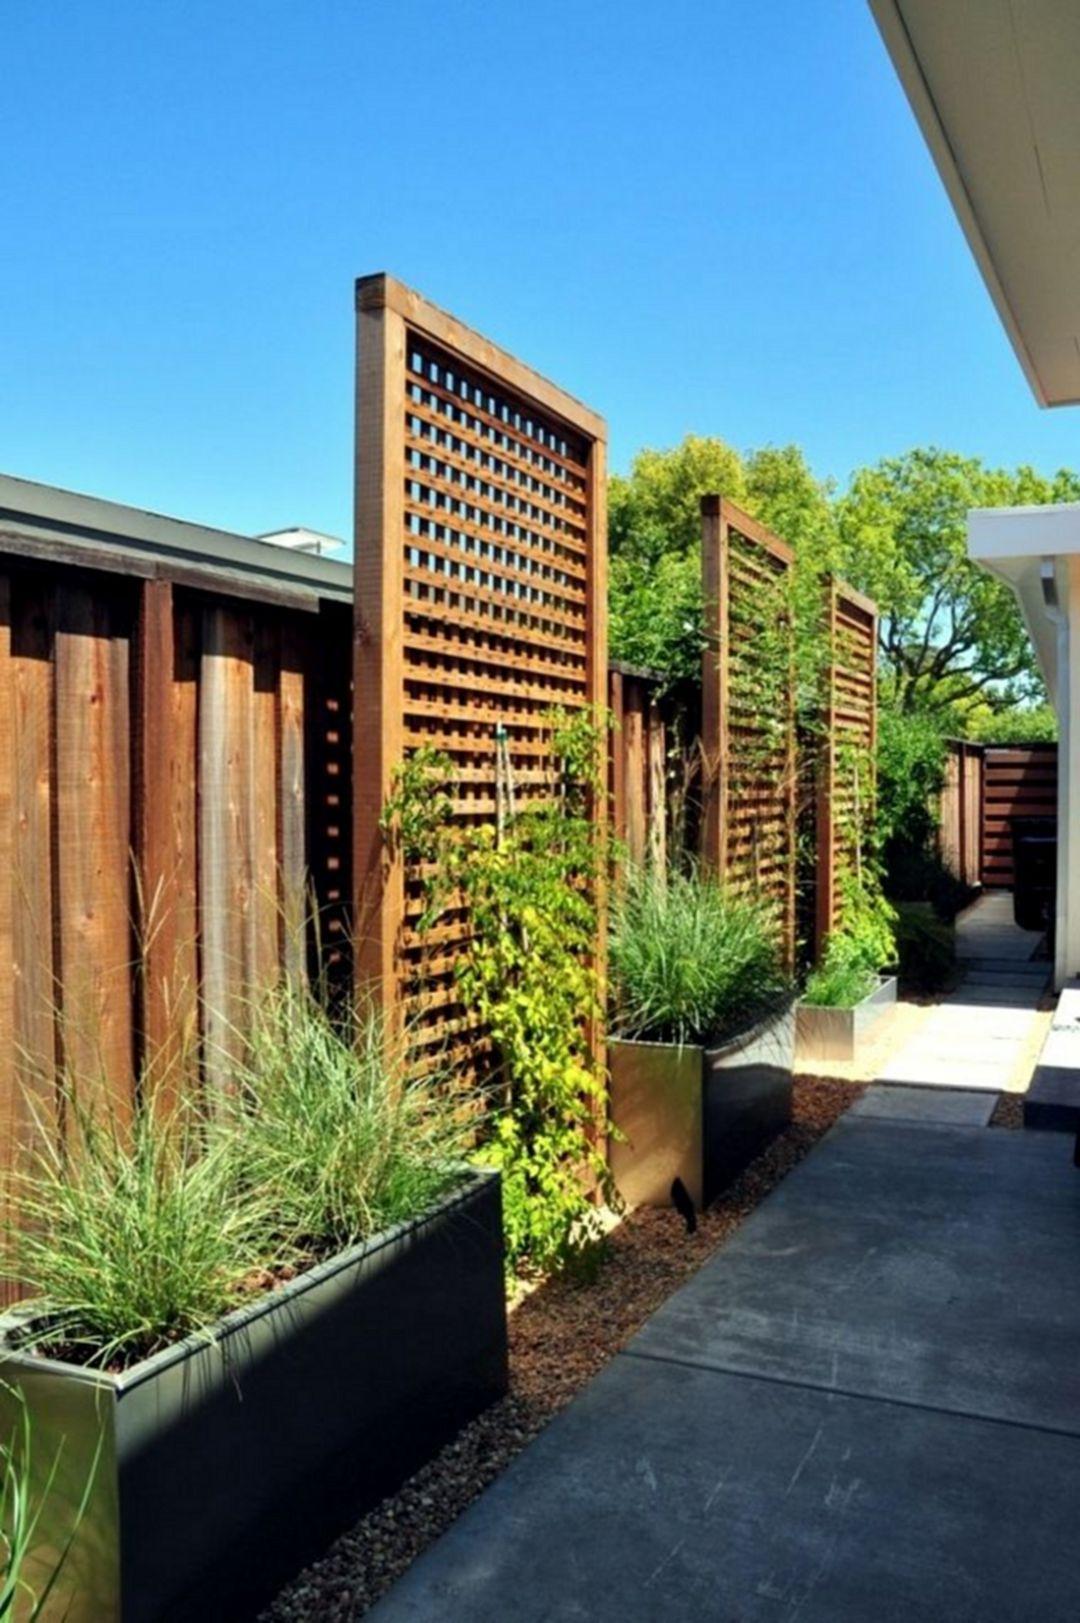 Backyard Privacy Fence Landscaping Ideas On A Budget 121 Backyard